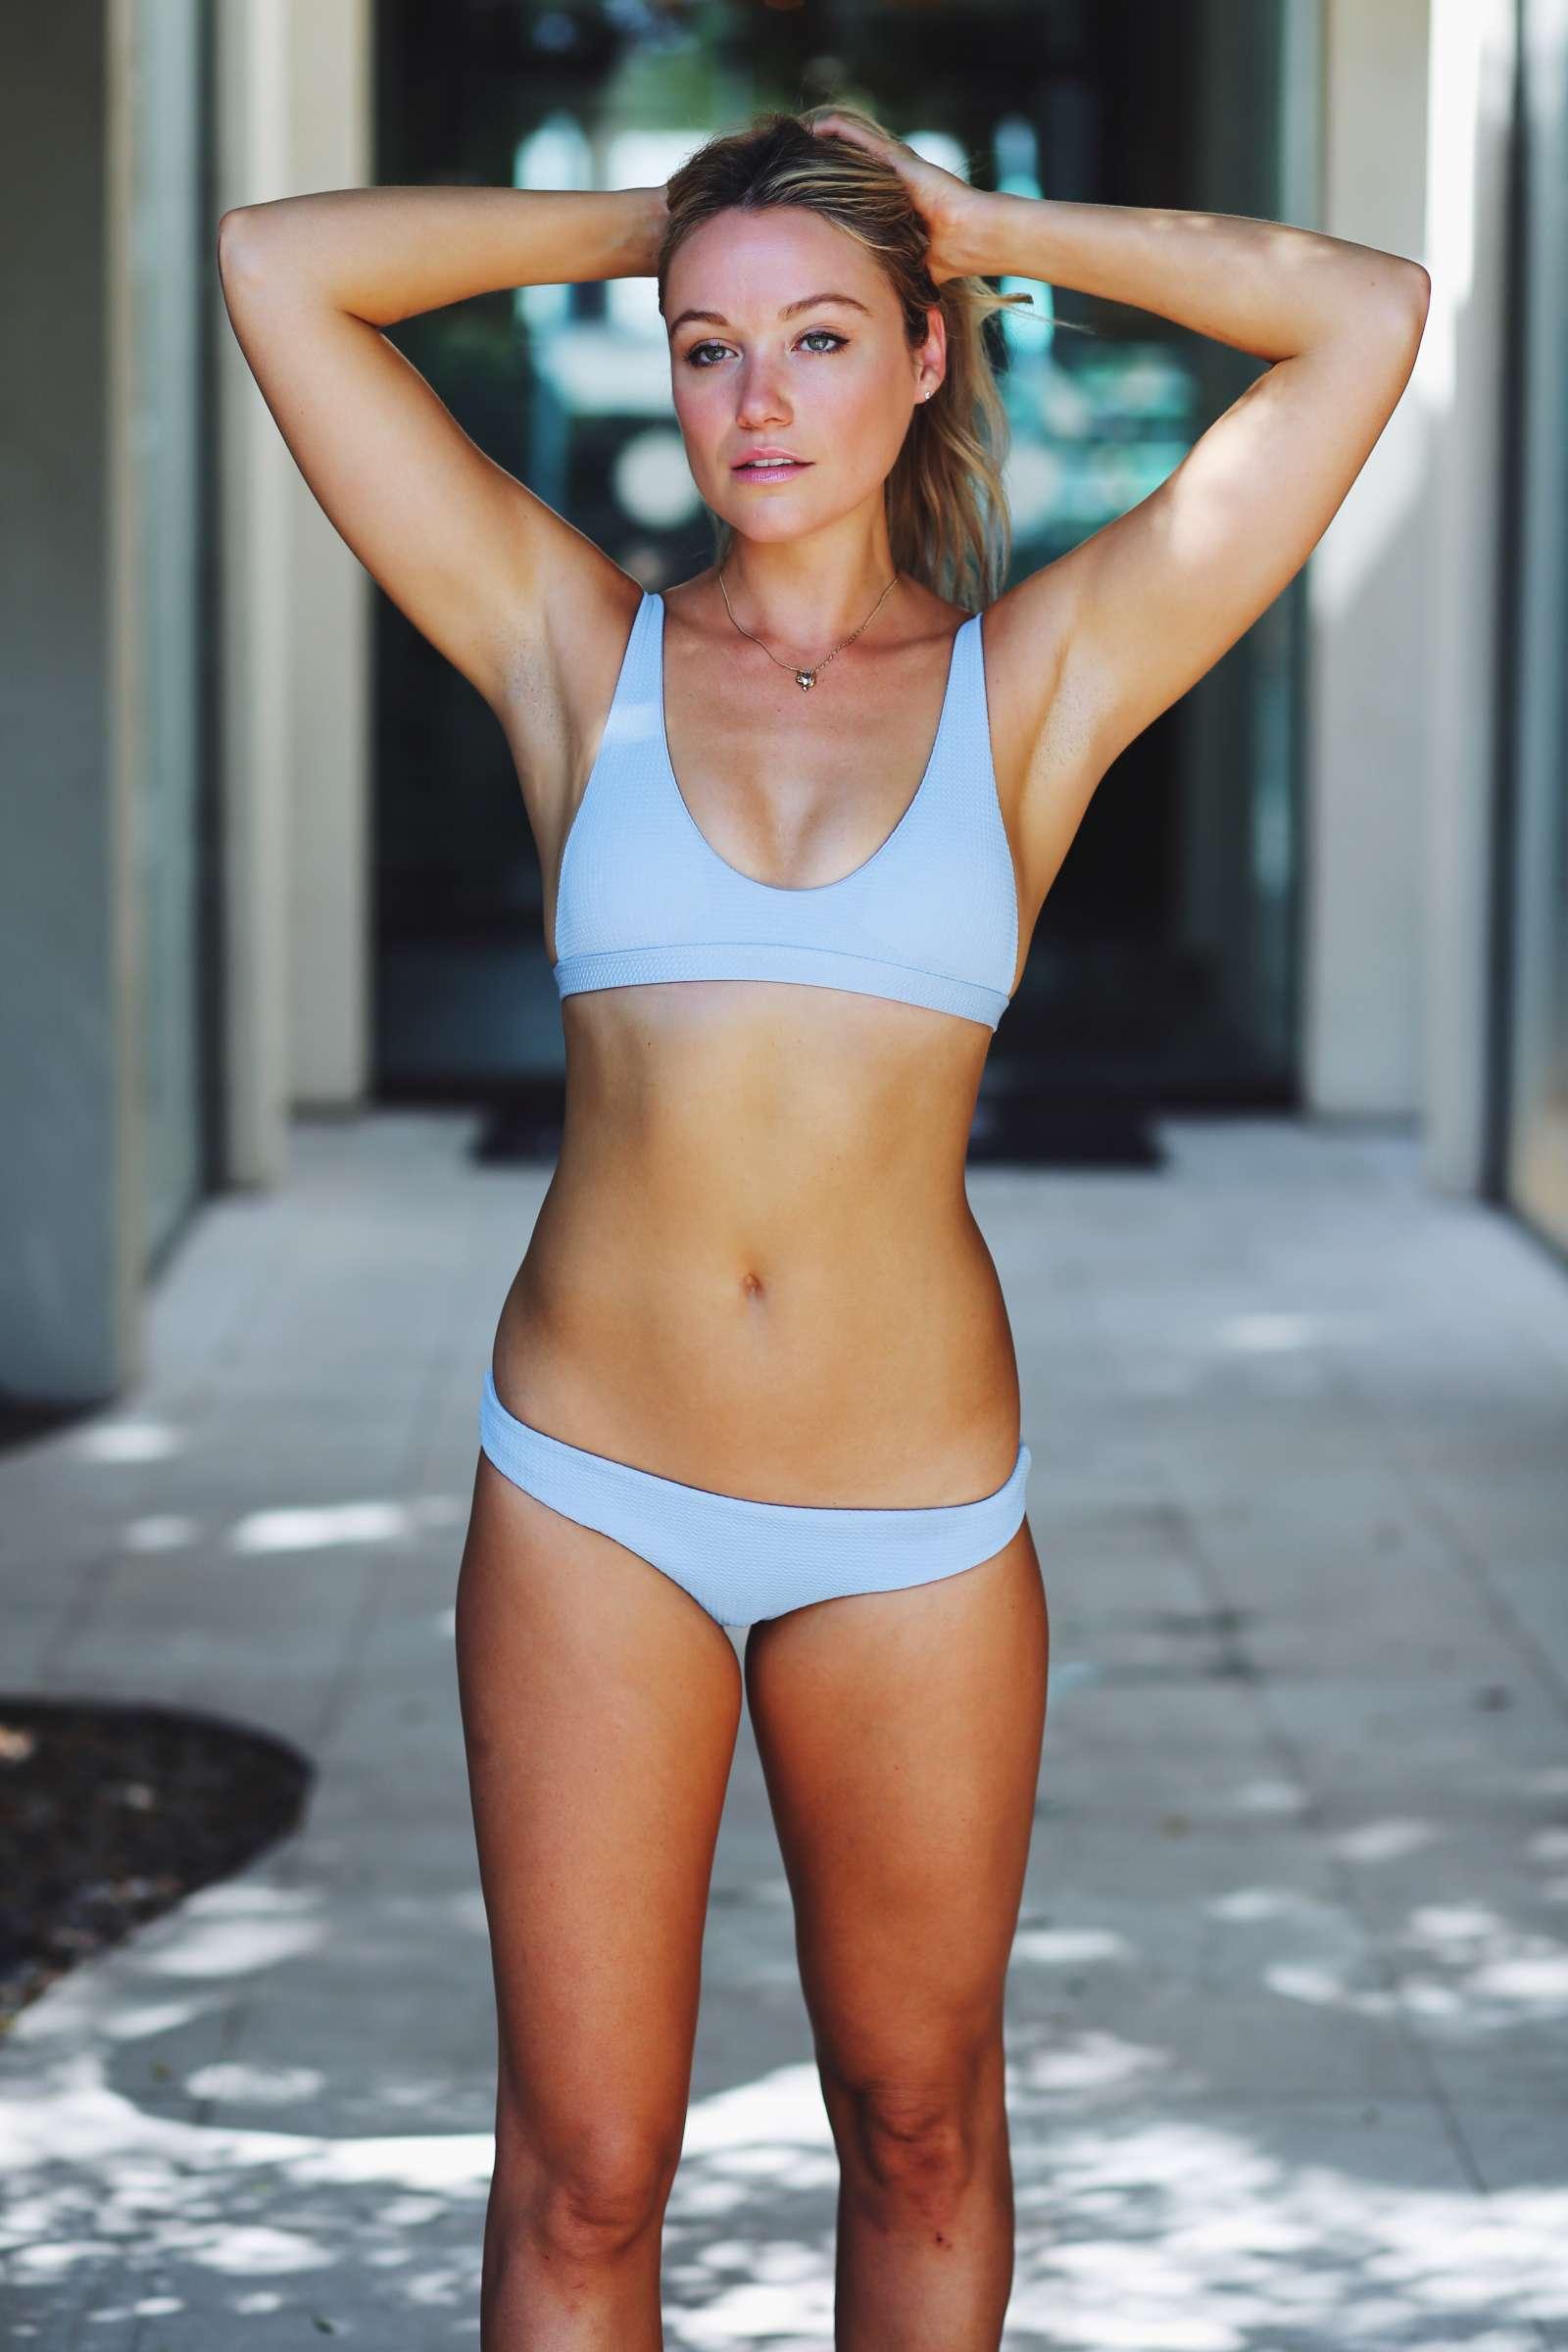 Hot Megan Barton Hanson nudes (81 foto and video), Ass, Sideboobs, Feet, in bikini 2017